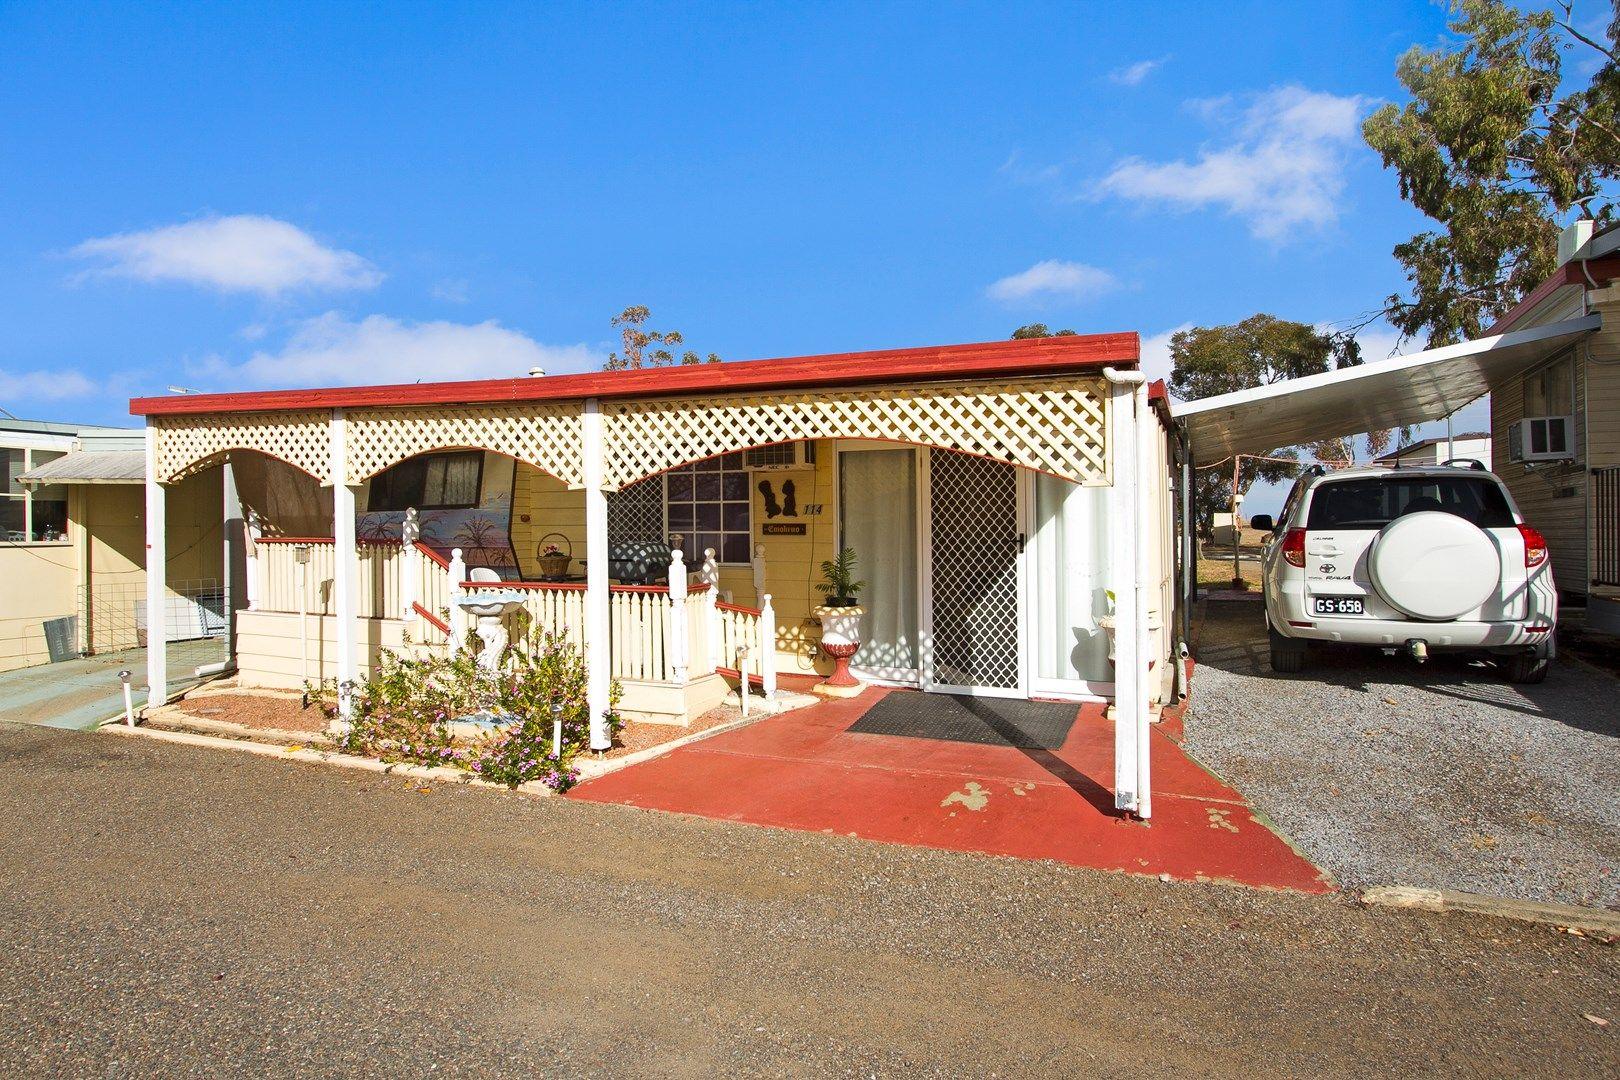 114, 612-628 Goonoo Goonoo Road - City Lights Caravan Park, Tamworth NSW 2340, Image 0